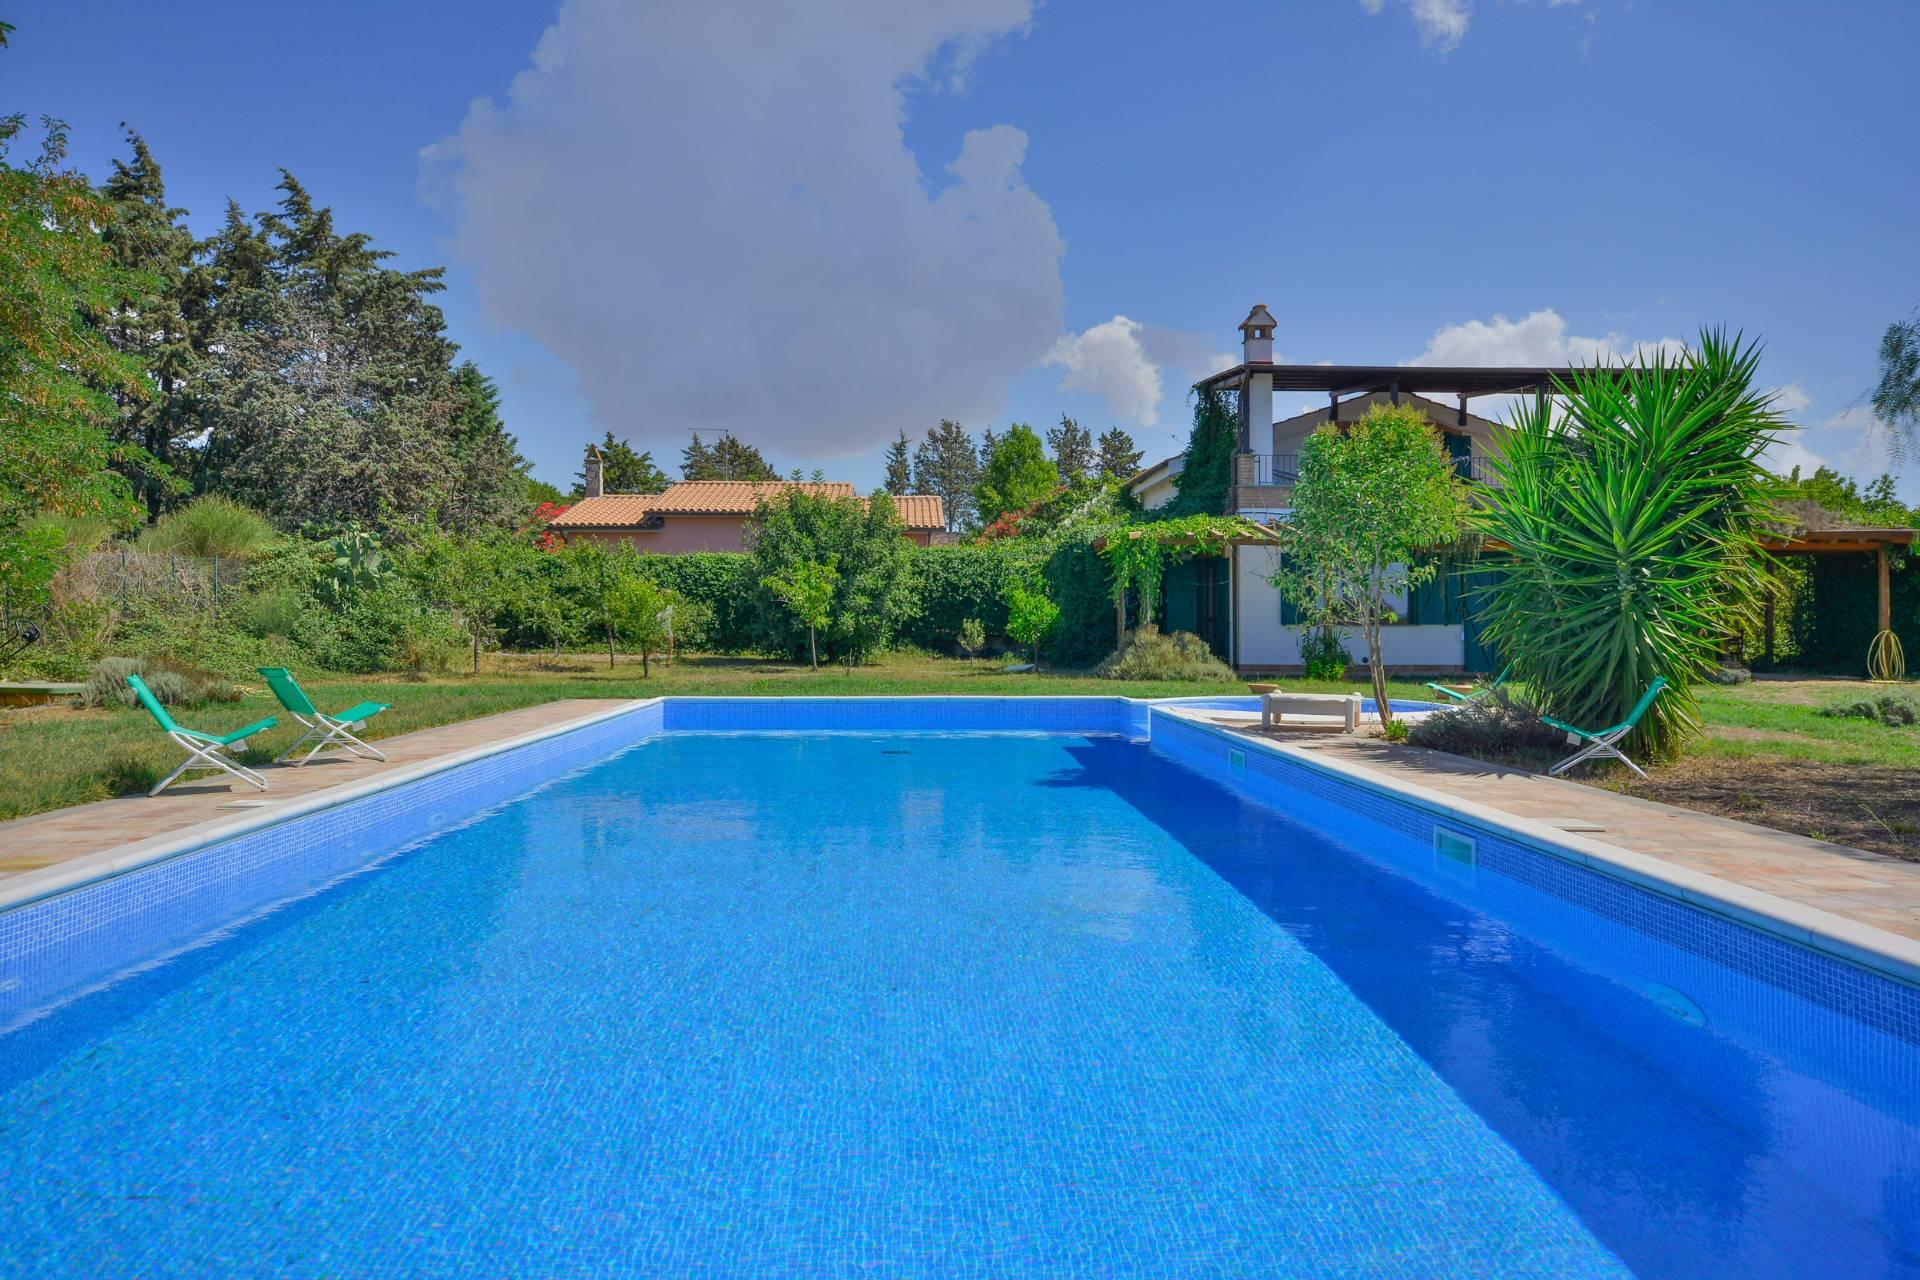 Cbi083 Montalto01s Villa Singola In Vendita A Montalto